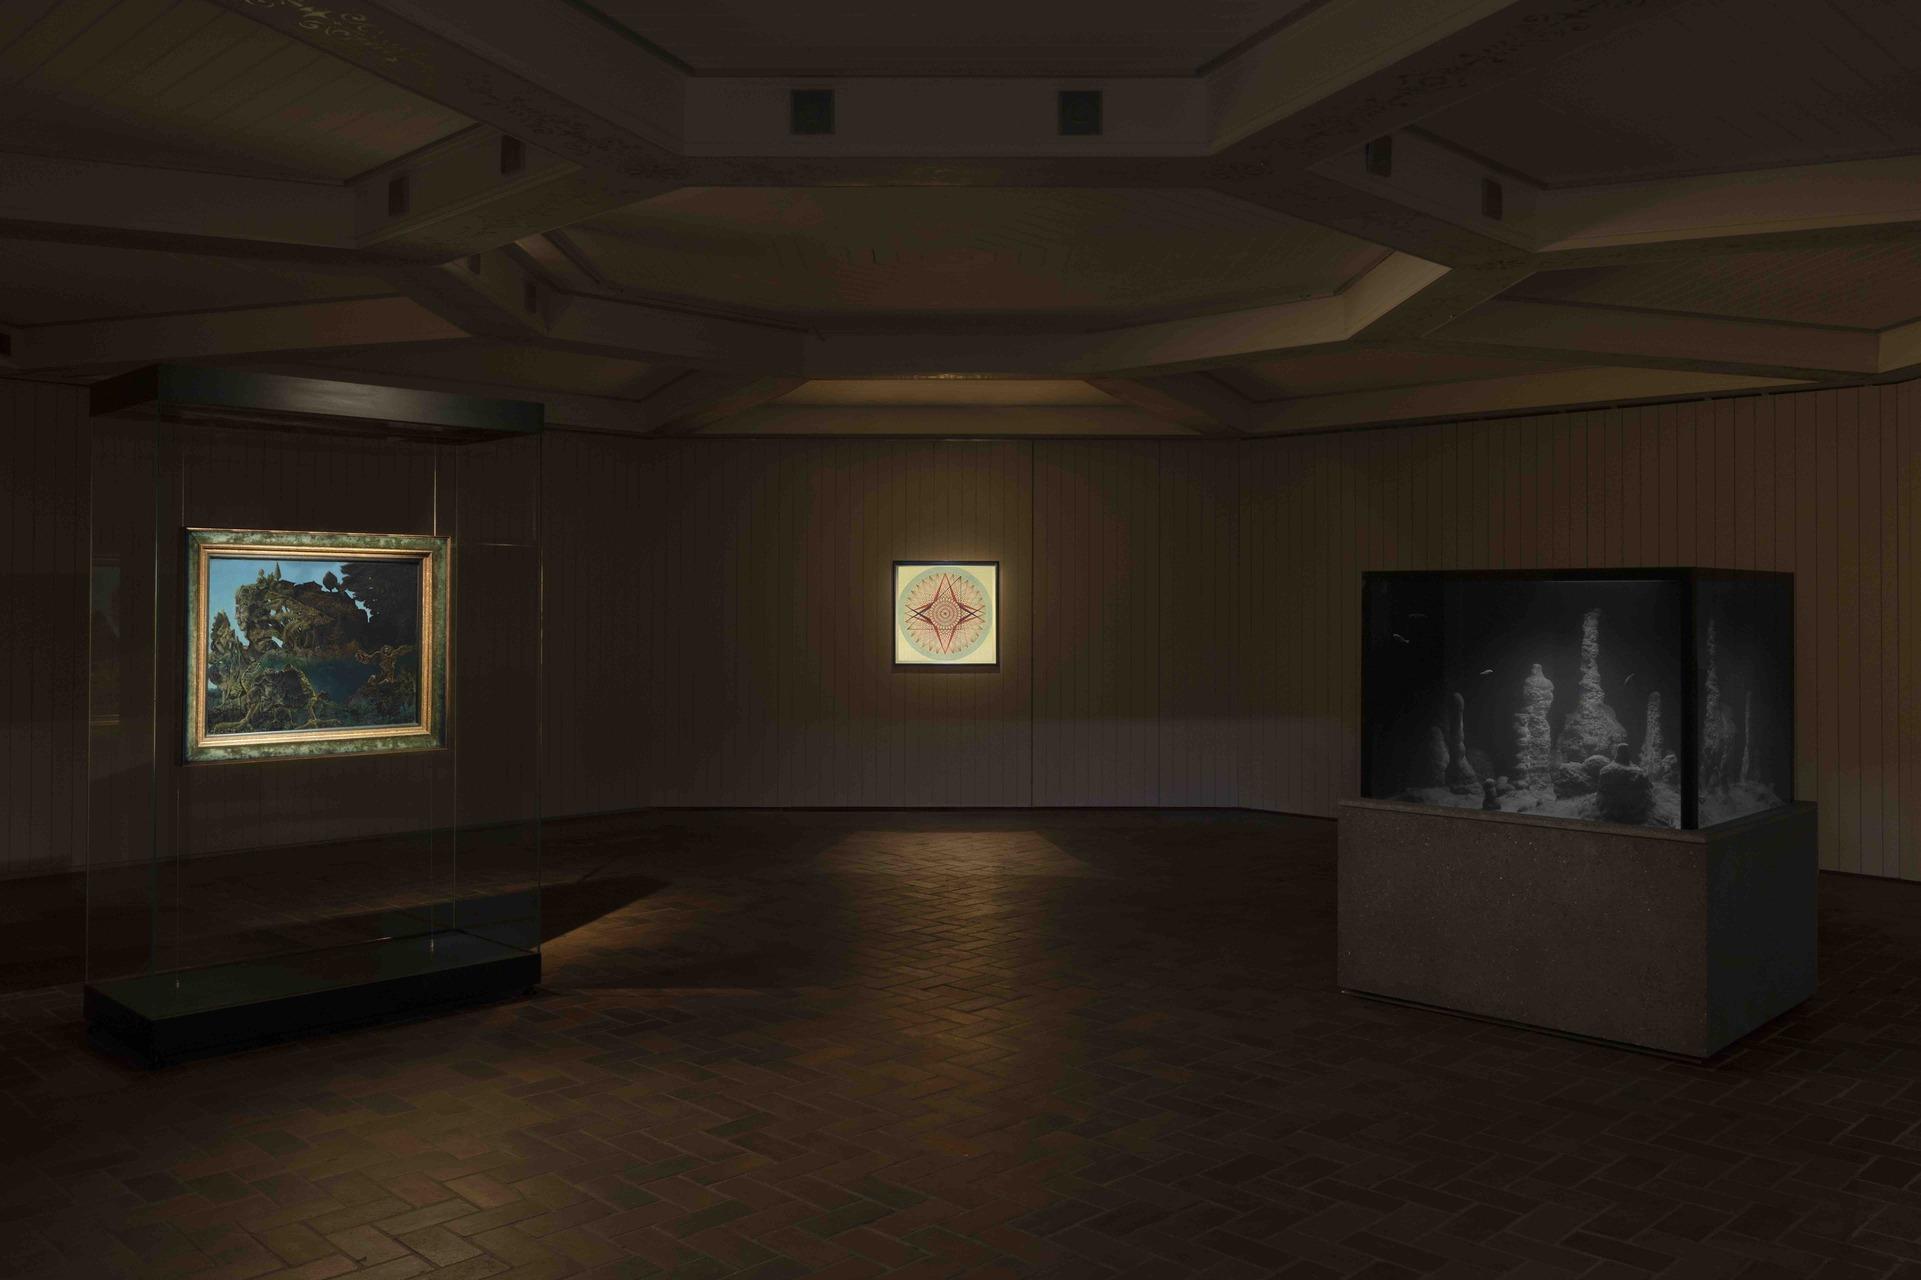 Installation view from left to right: Max Ernst, Emma Kunz, Pierre Hughye